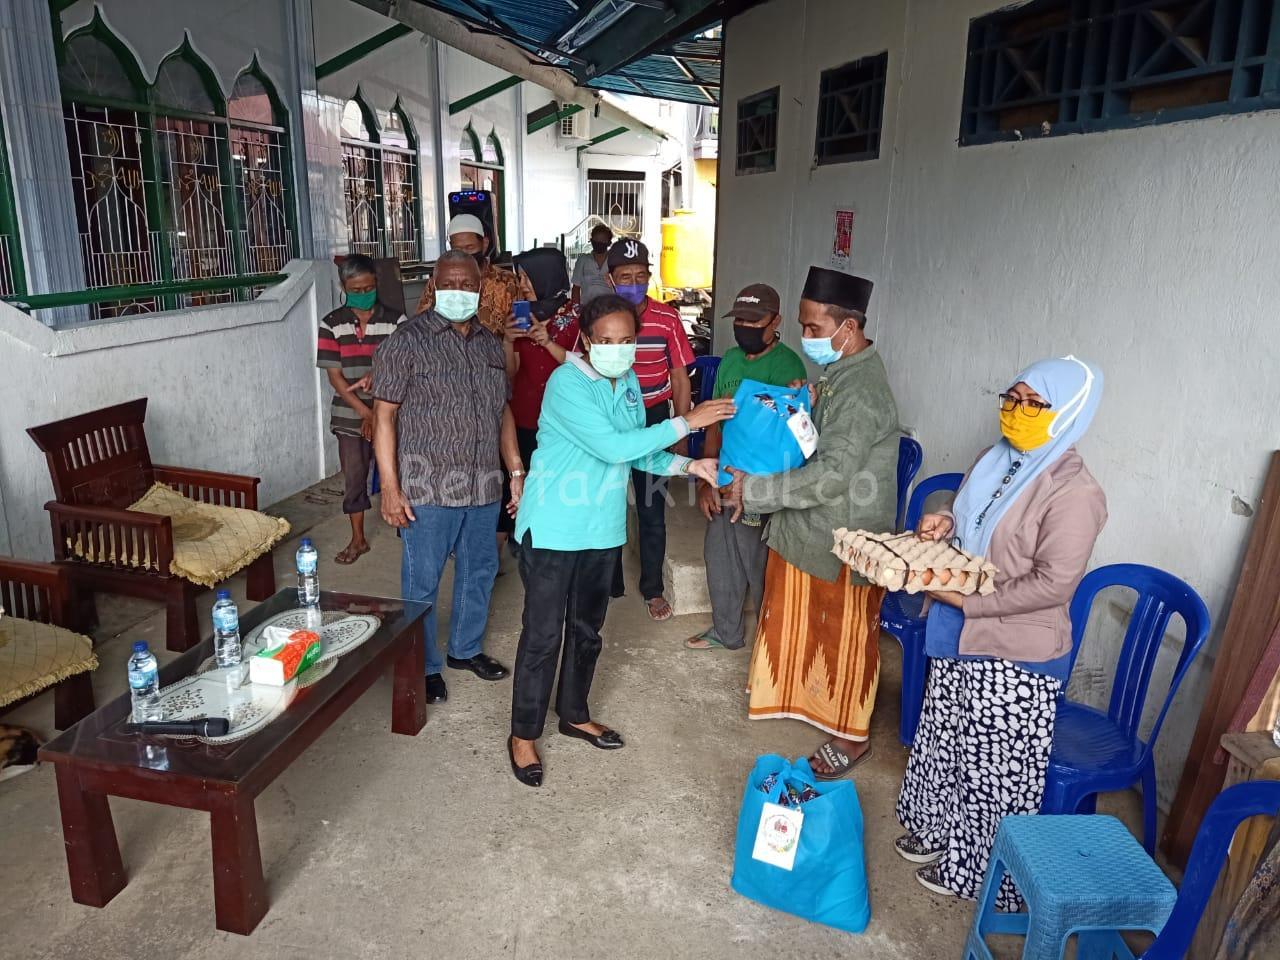 Lagi, Keluarga Mandacan -Kiriweno Serahkan 521 Paket Bama ke Ratusan Umat di Manokwari 25 IMG 20200418 WA0035